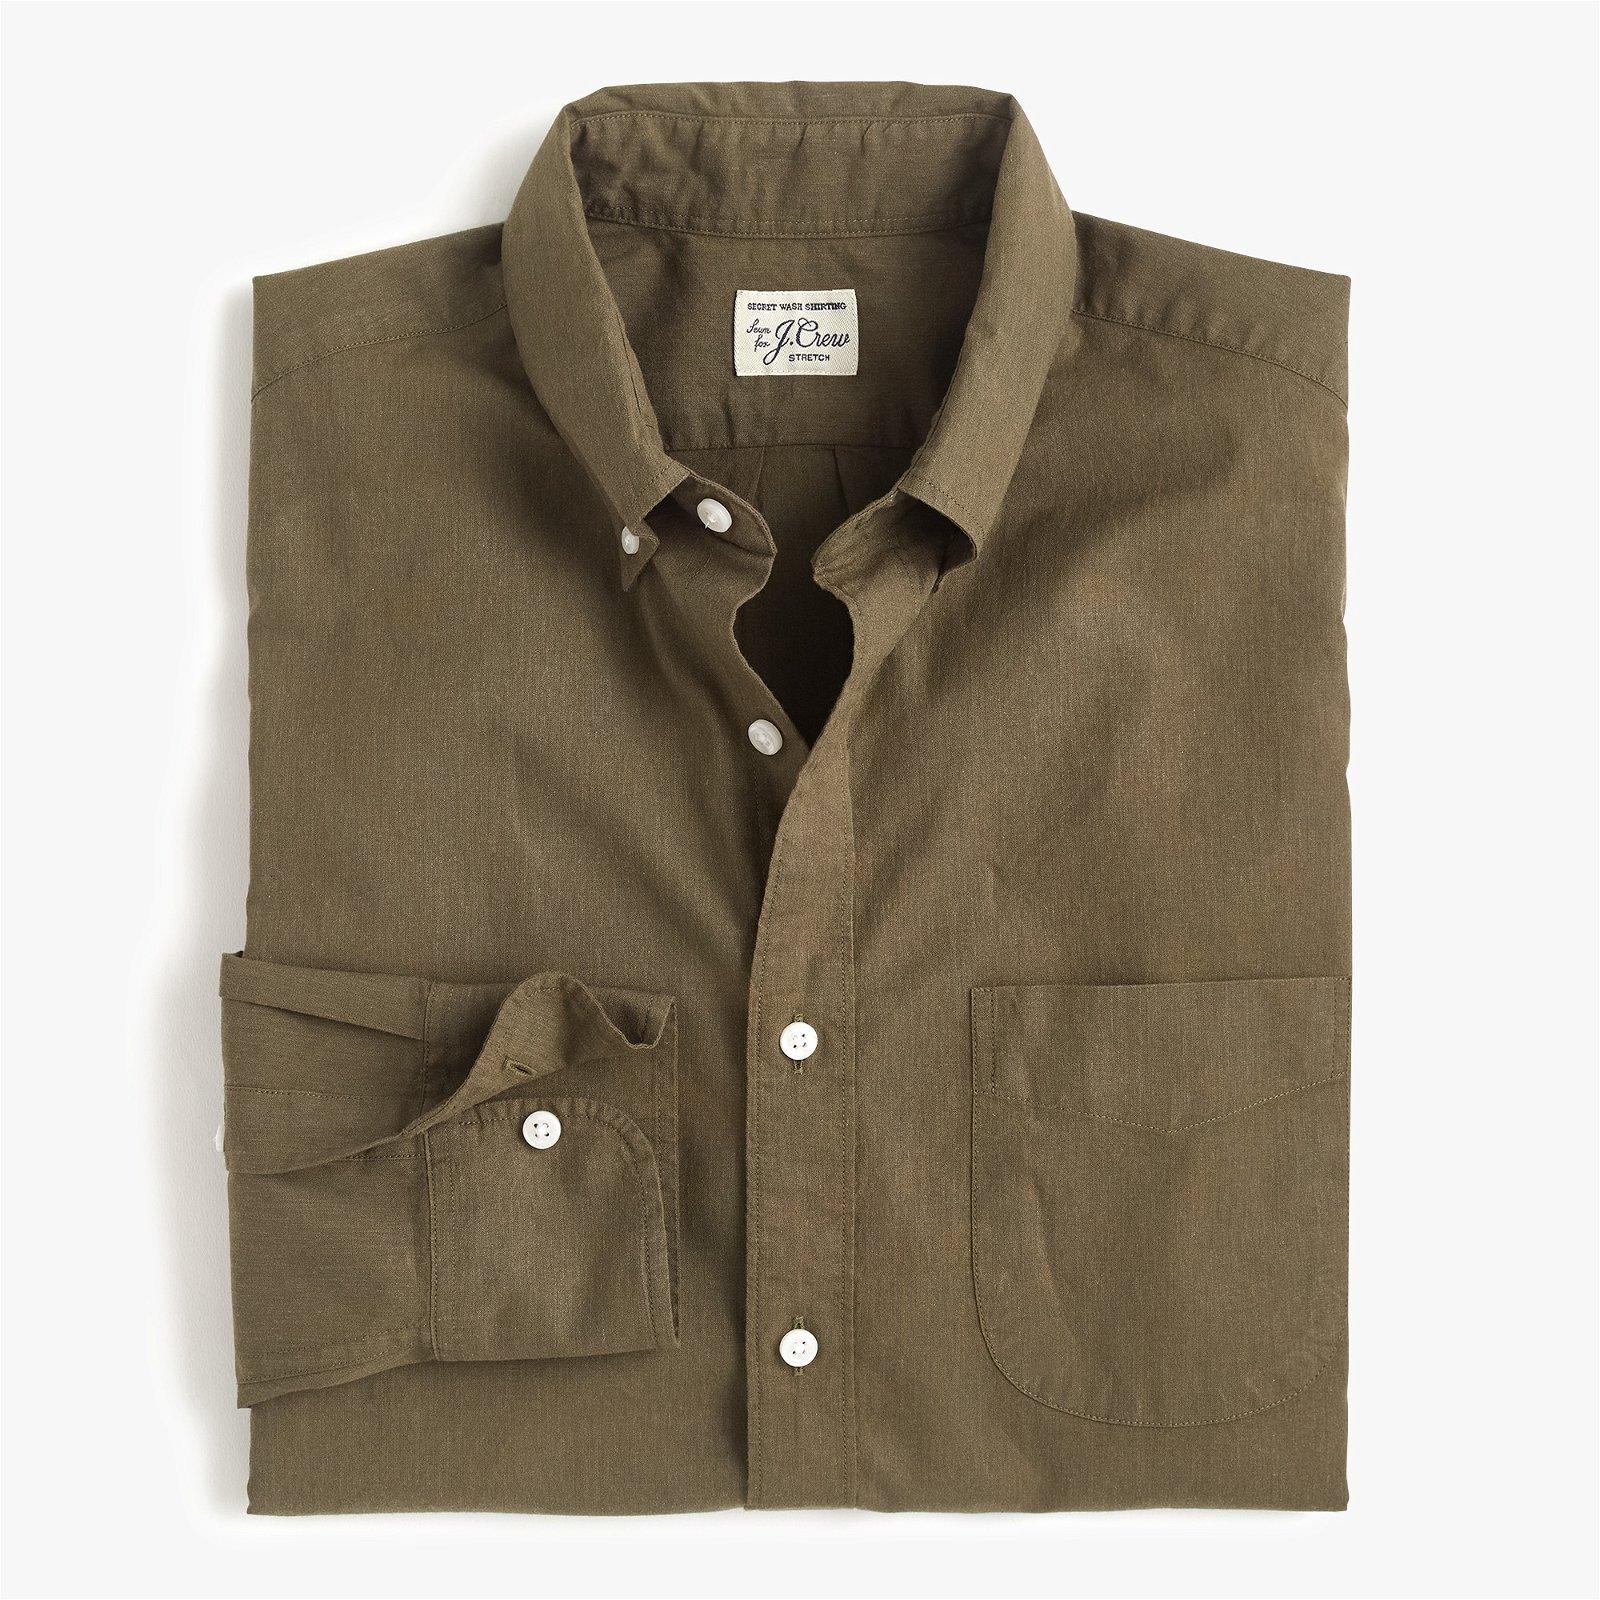 Classic Stretch Secret Wash shirt in solid heathered poplin